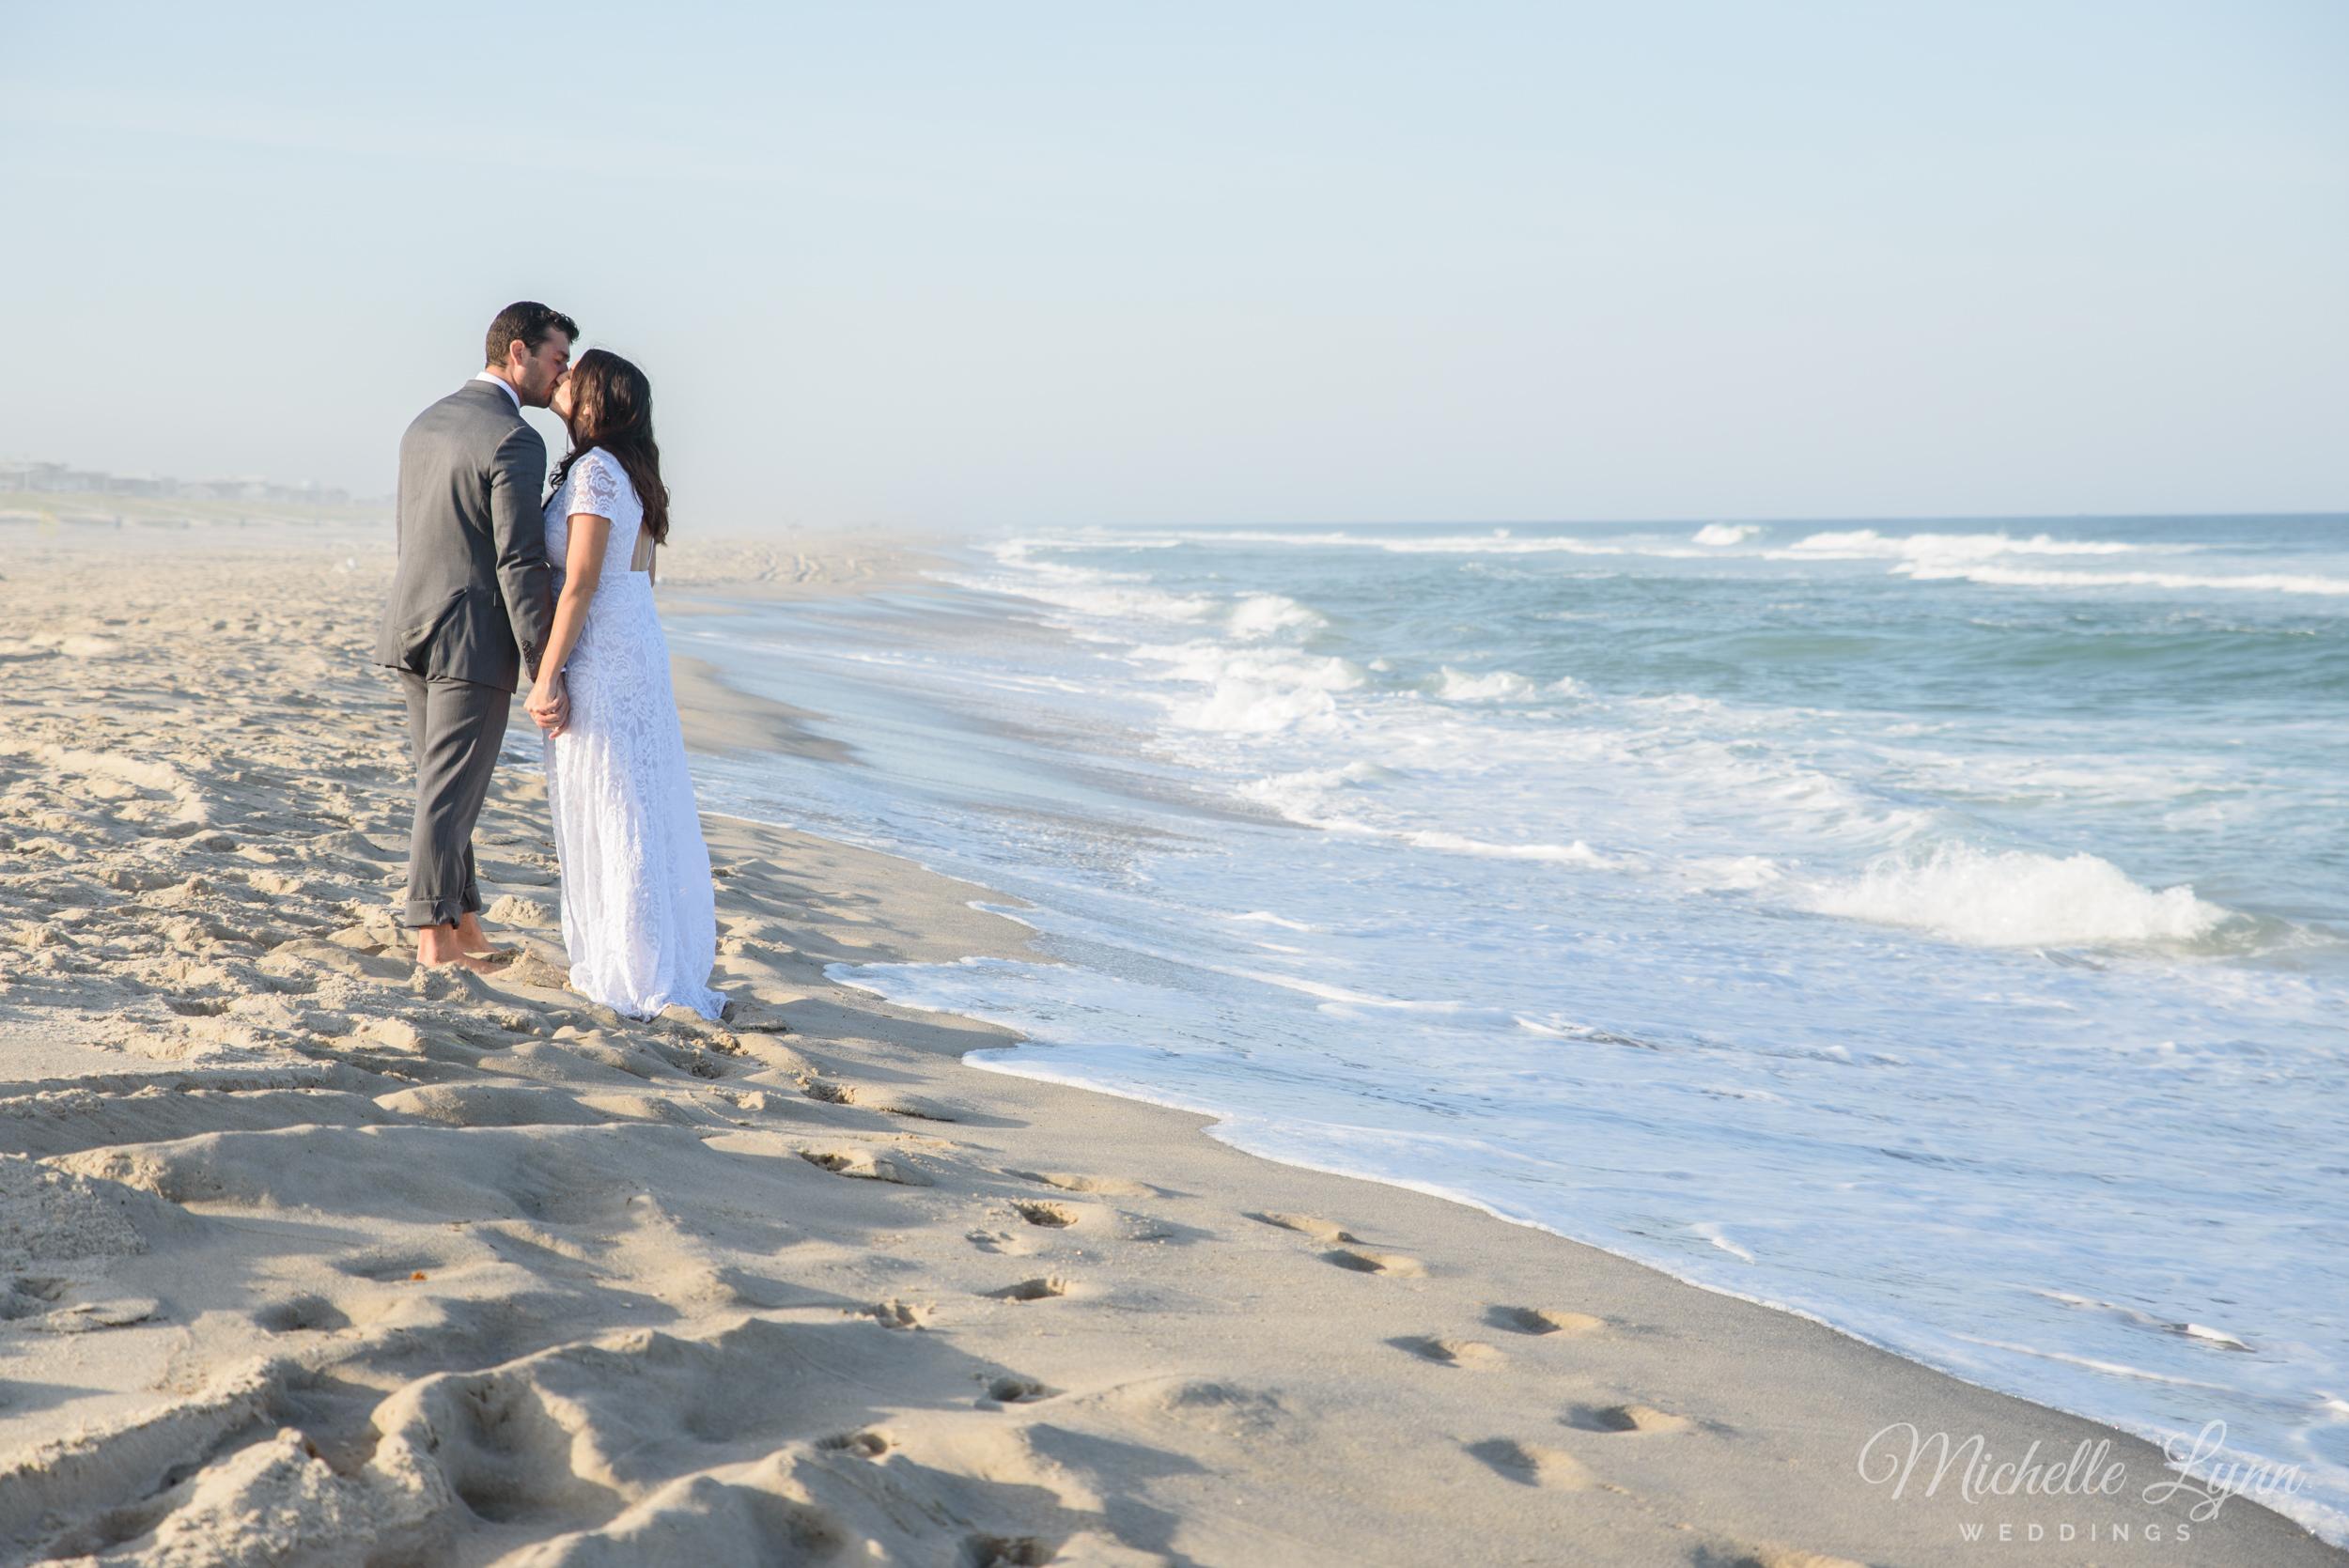 mlw-long-beach-island-new-jersey-wedding-photography-14.jpg